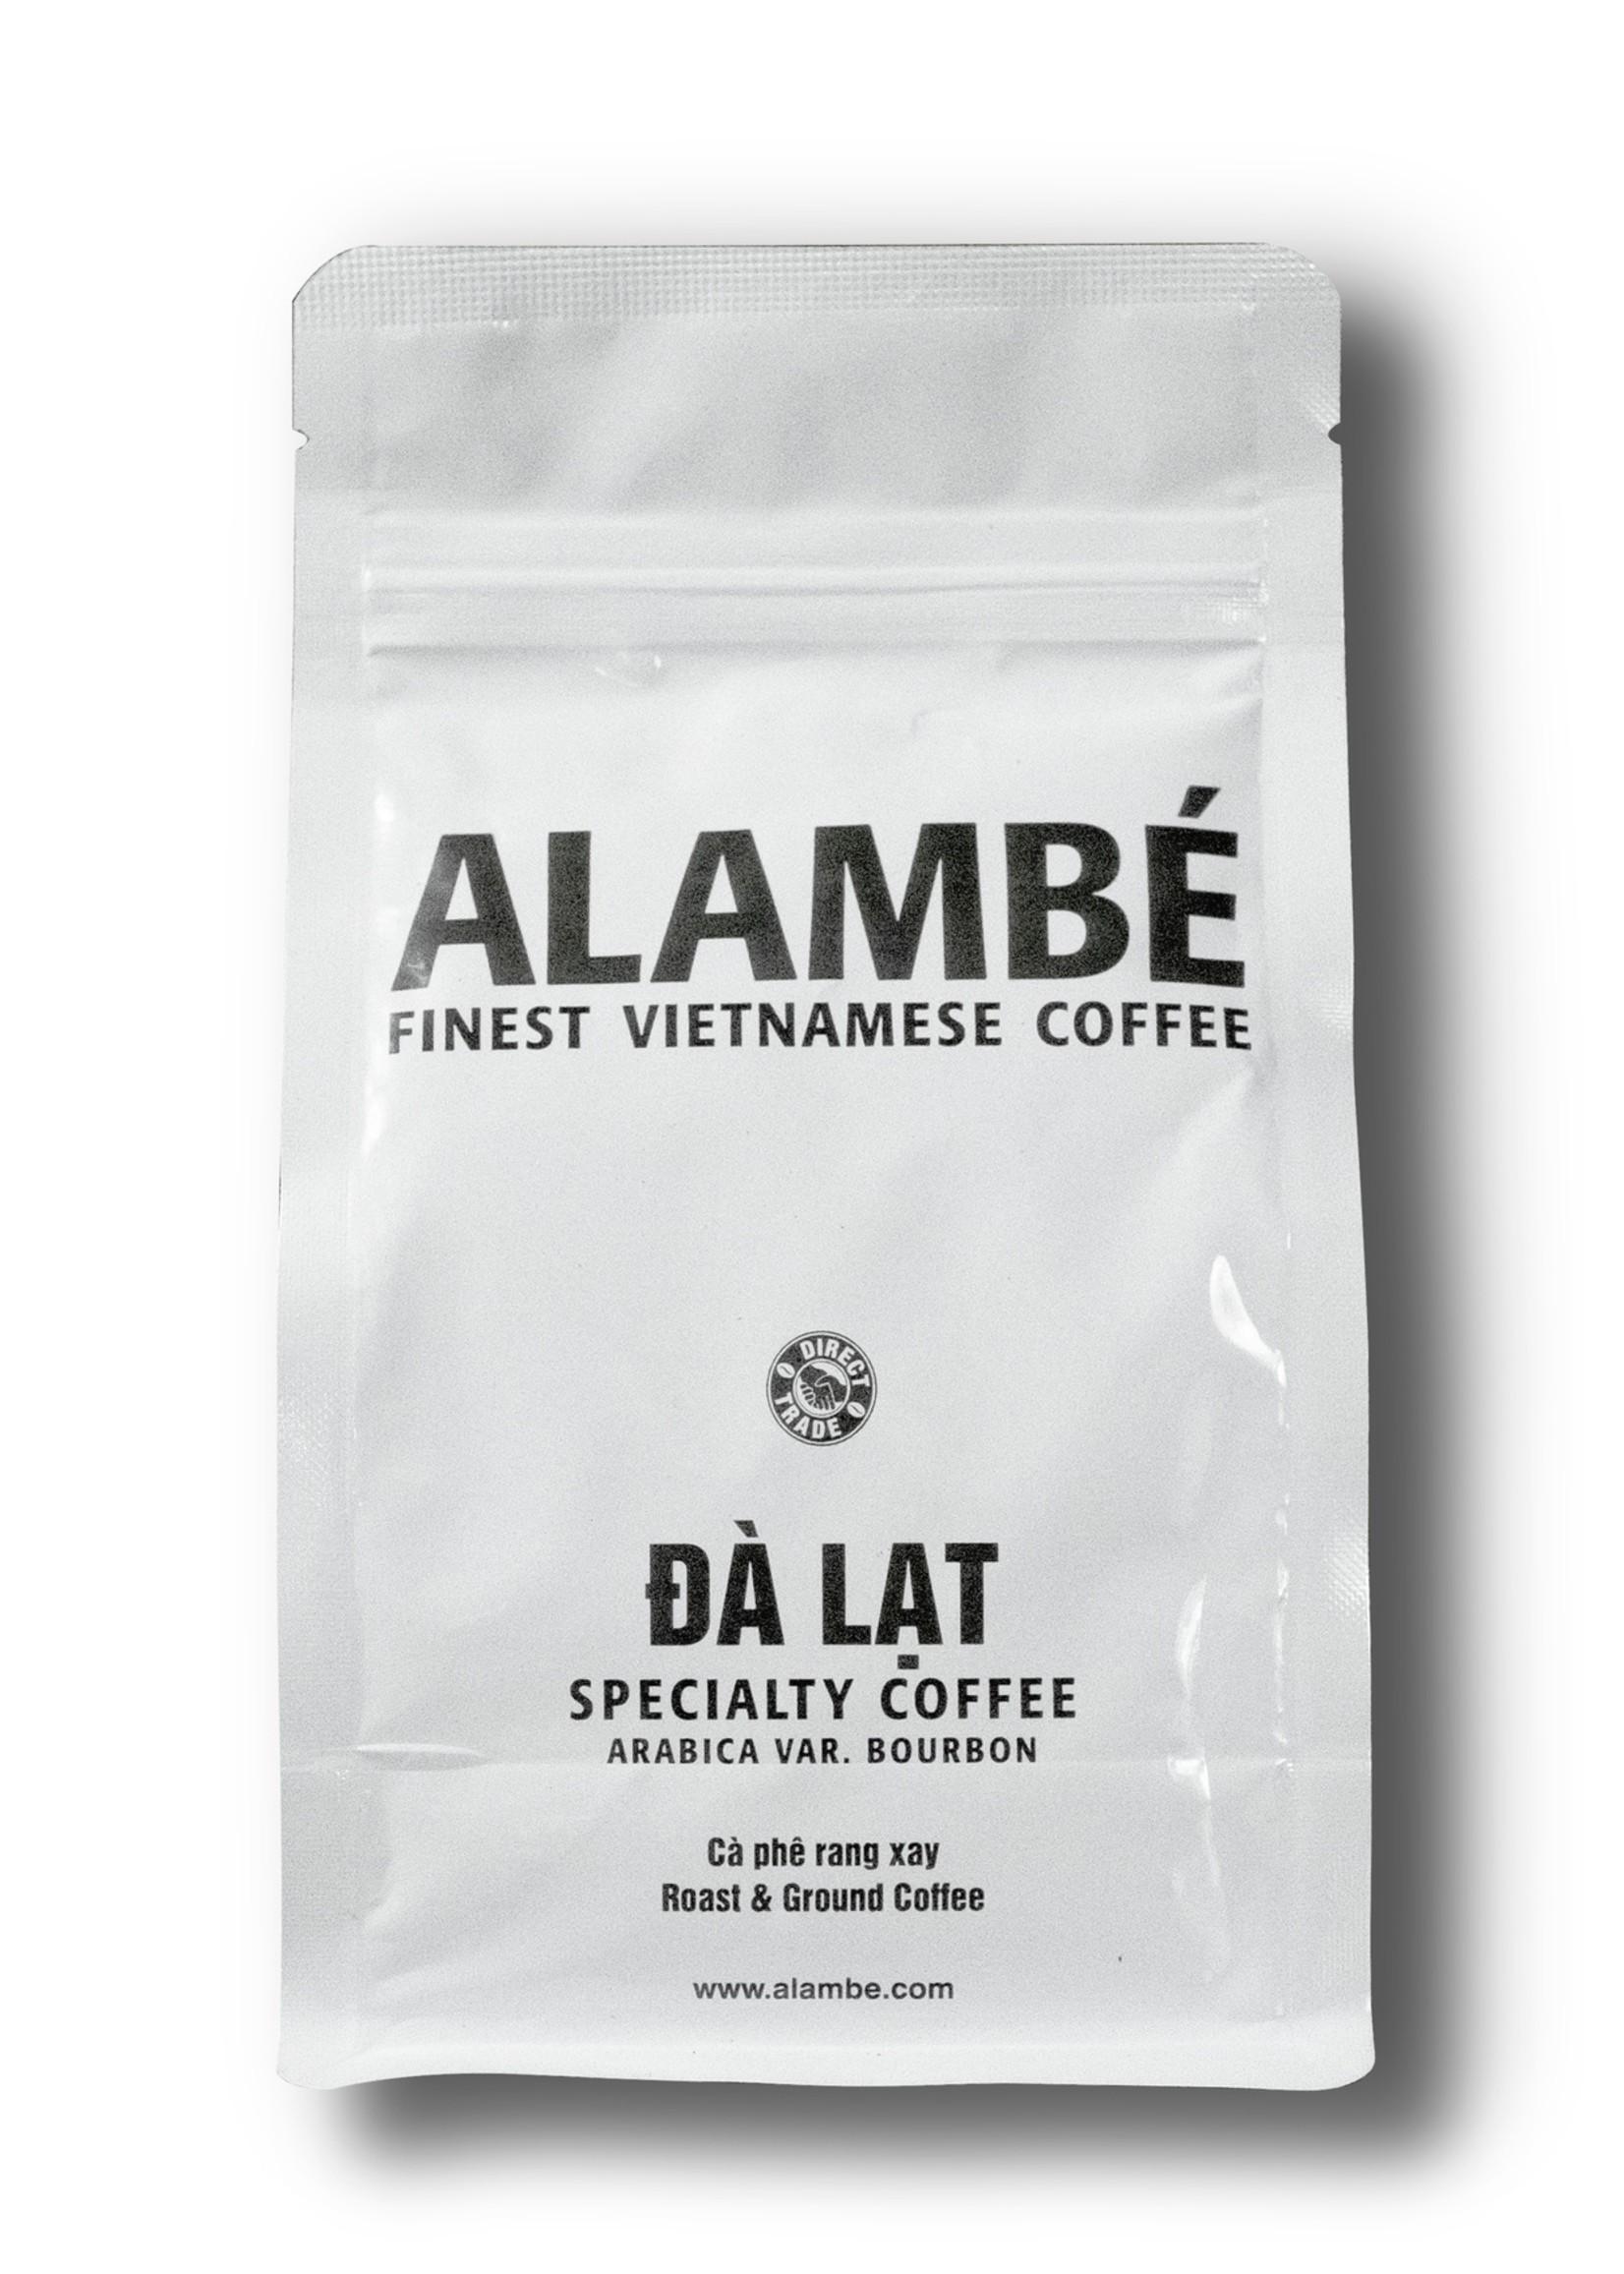 Alambé - Finest Vietnamese Coffee Da Lat – 100% Arabica Bourbon specialty coffee from Vietnam (230g ground)